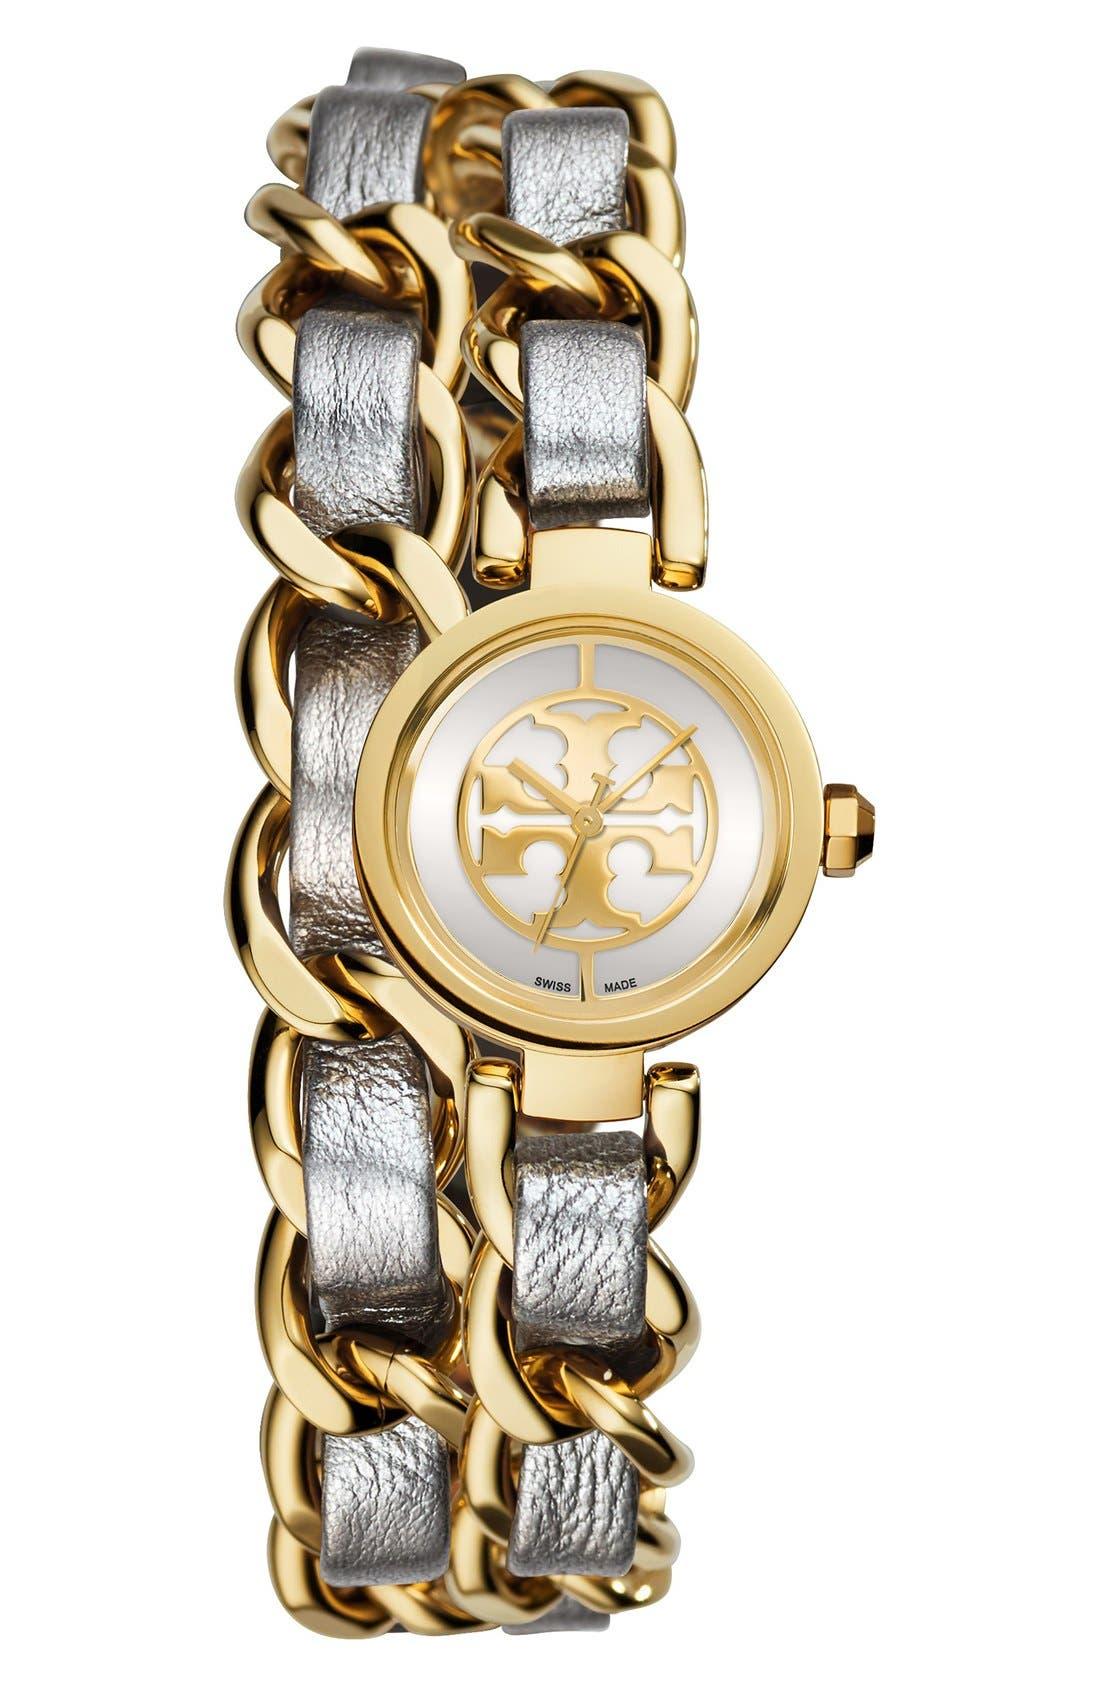 Main Image - Tory Burch 'Mini Reva' Double Wrap Chain Watch, 20mm